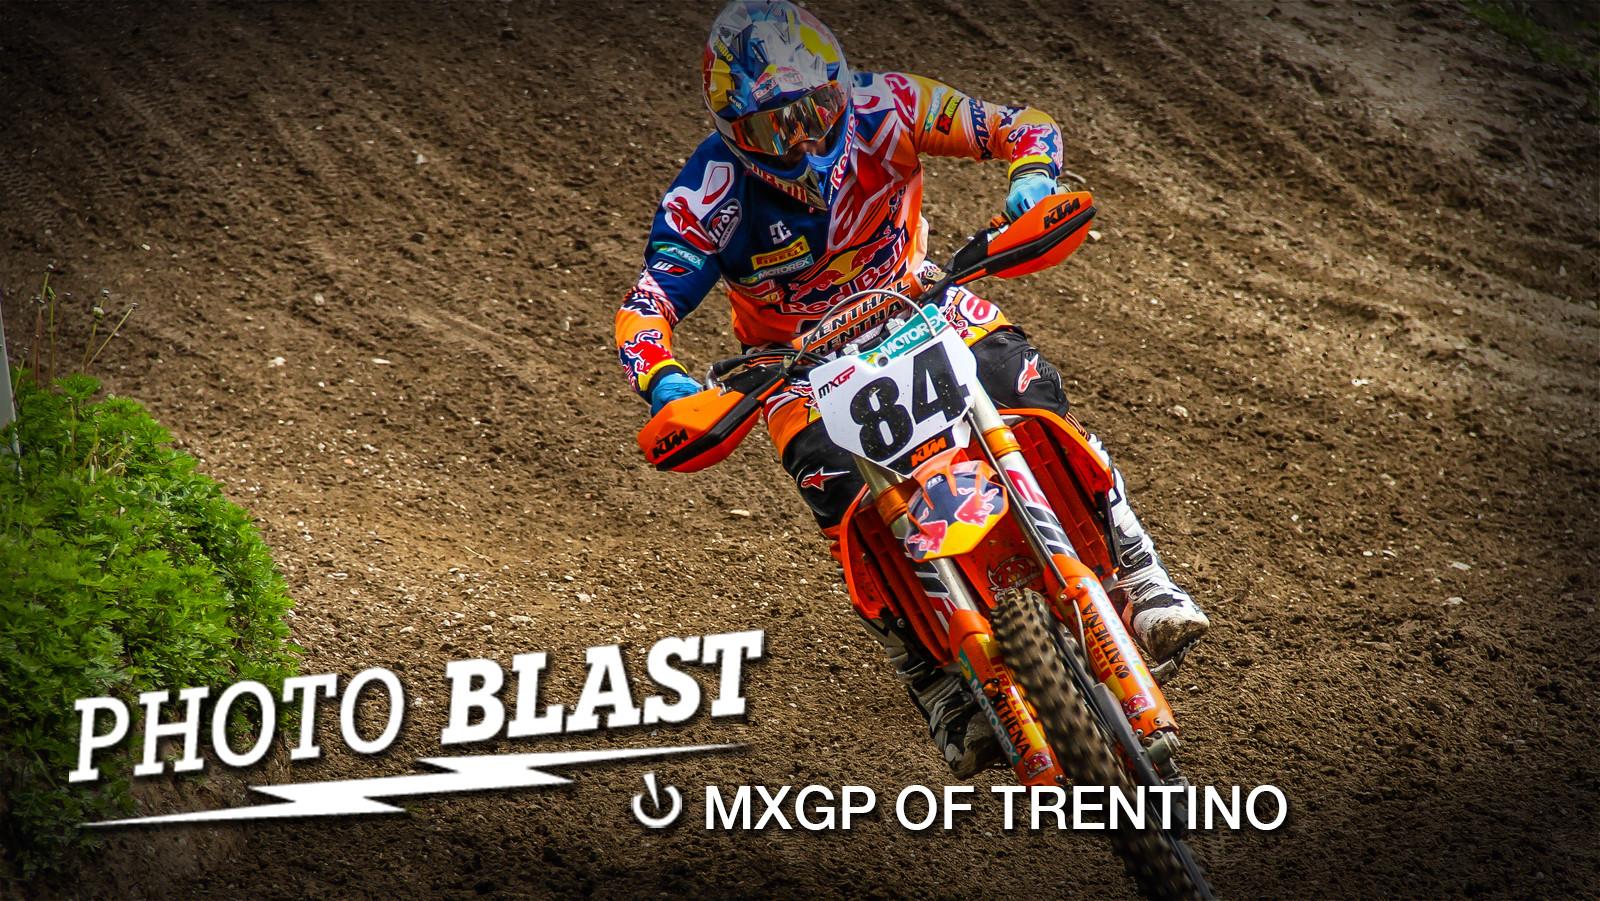 Jeffrey Herlings - Photo Blast: 2017 MXGP of Trentino - Motocross Pictures - Vital MX